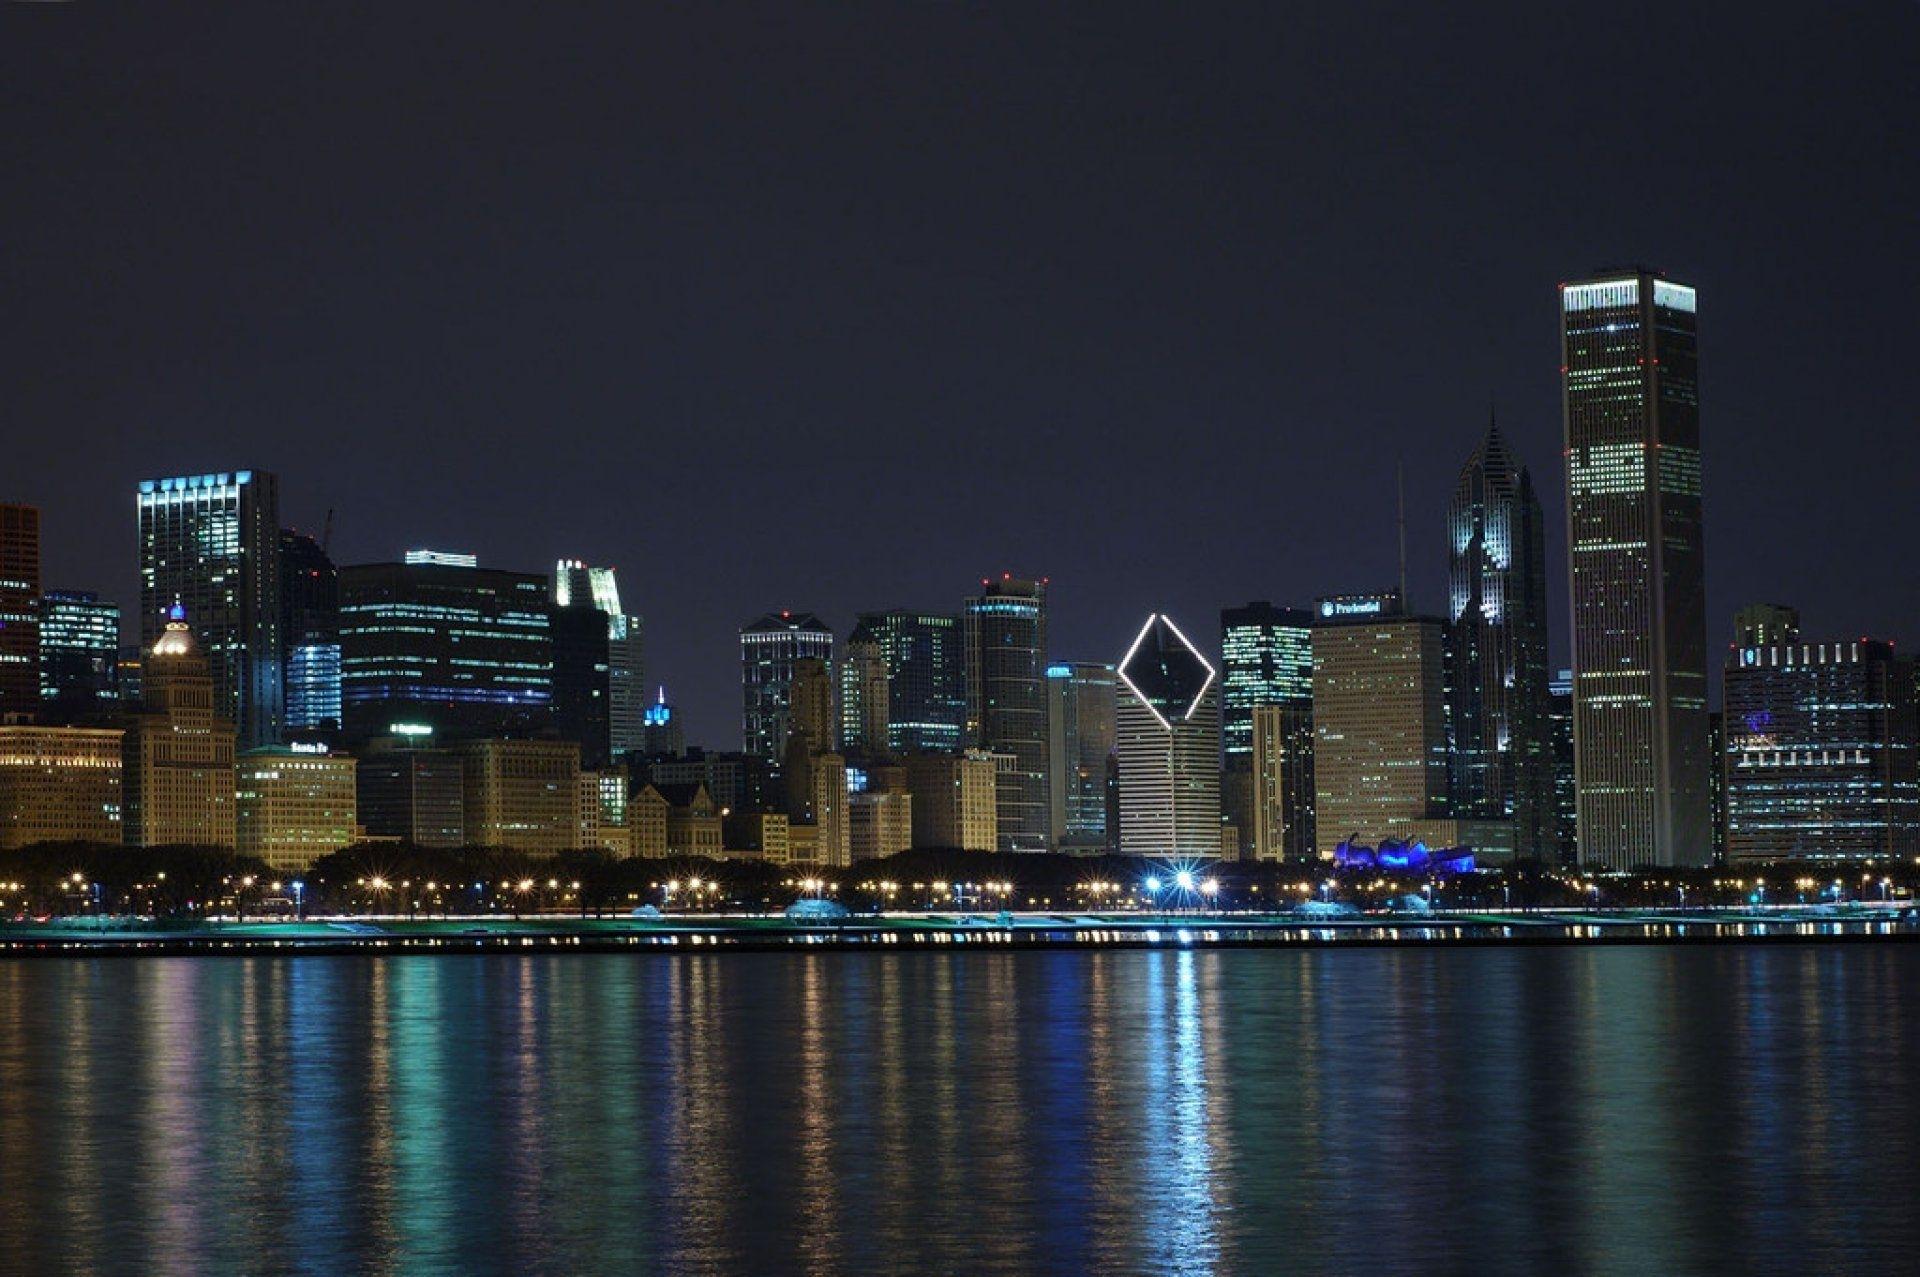 chicago skyline wallpaper. | chicago love | pinterest | chicago